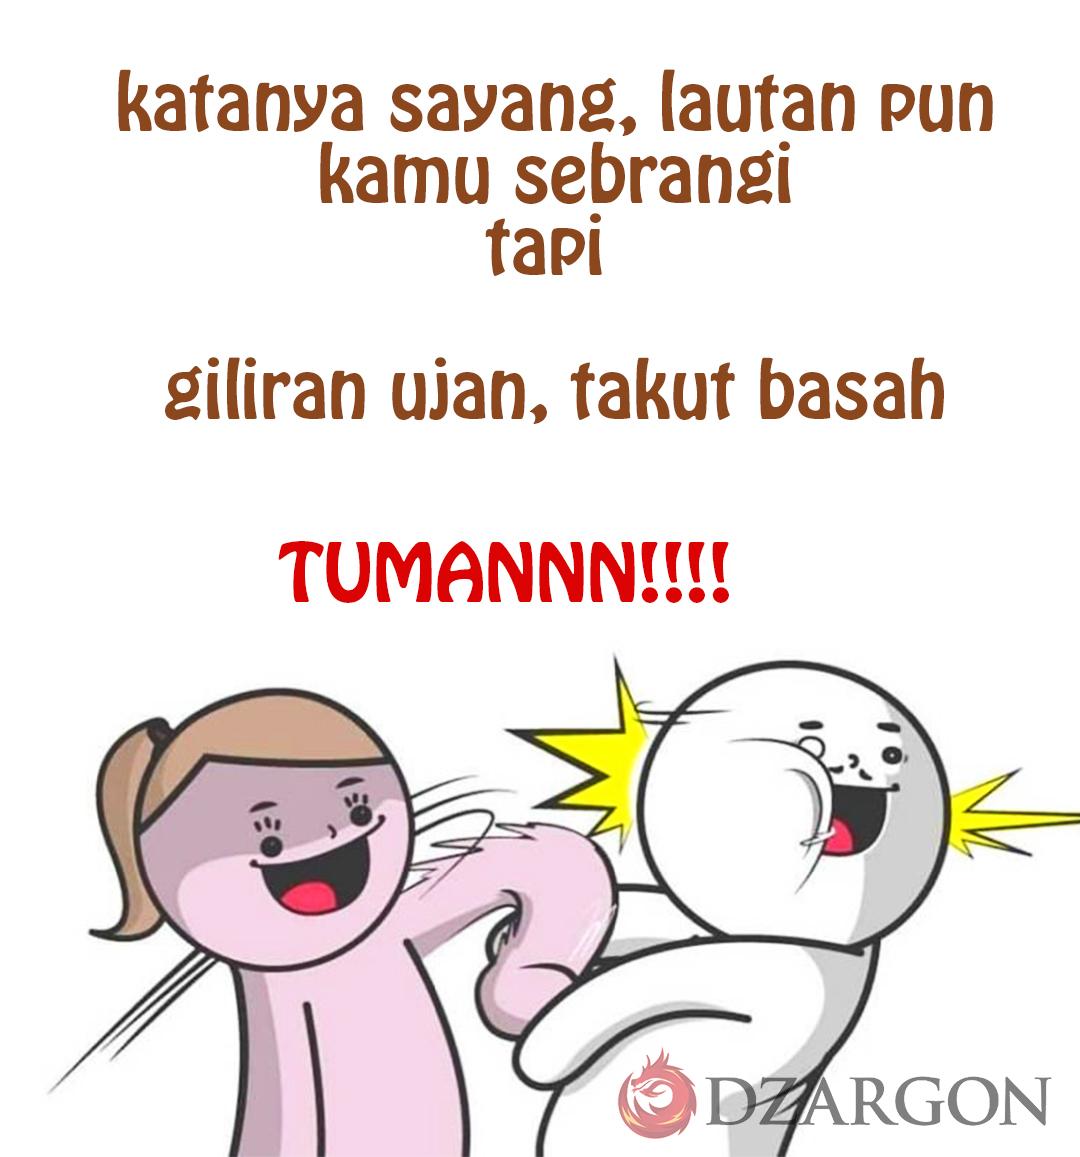 Meme Lucu Tuman cowok takut basah